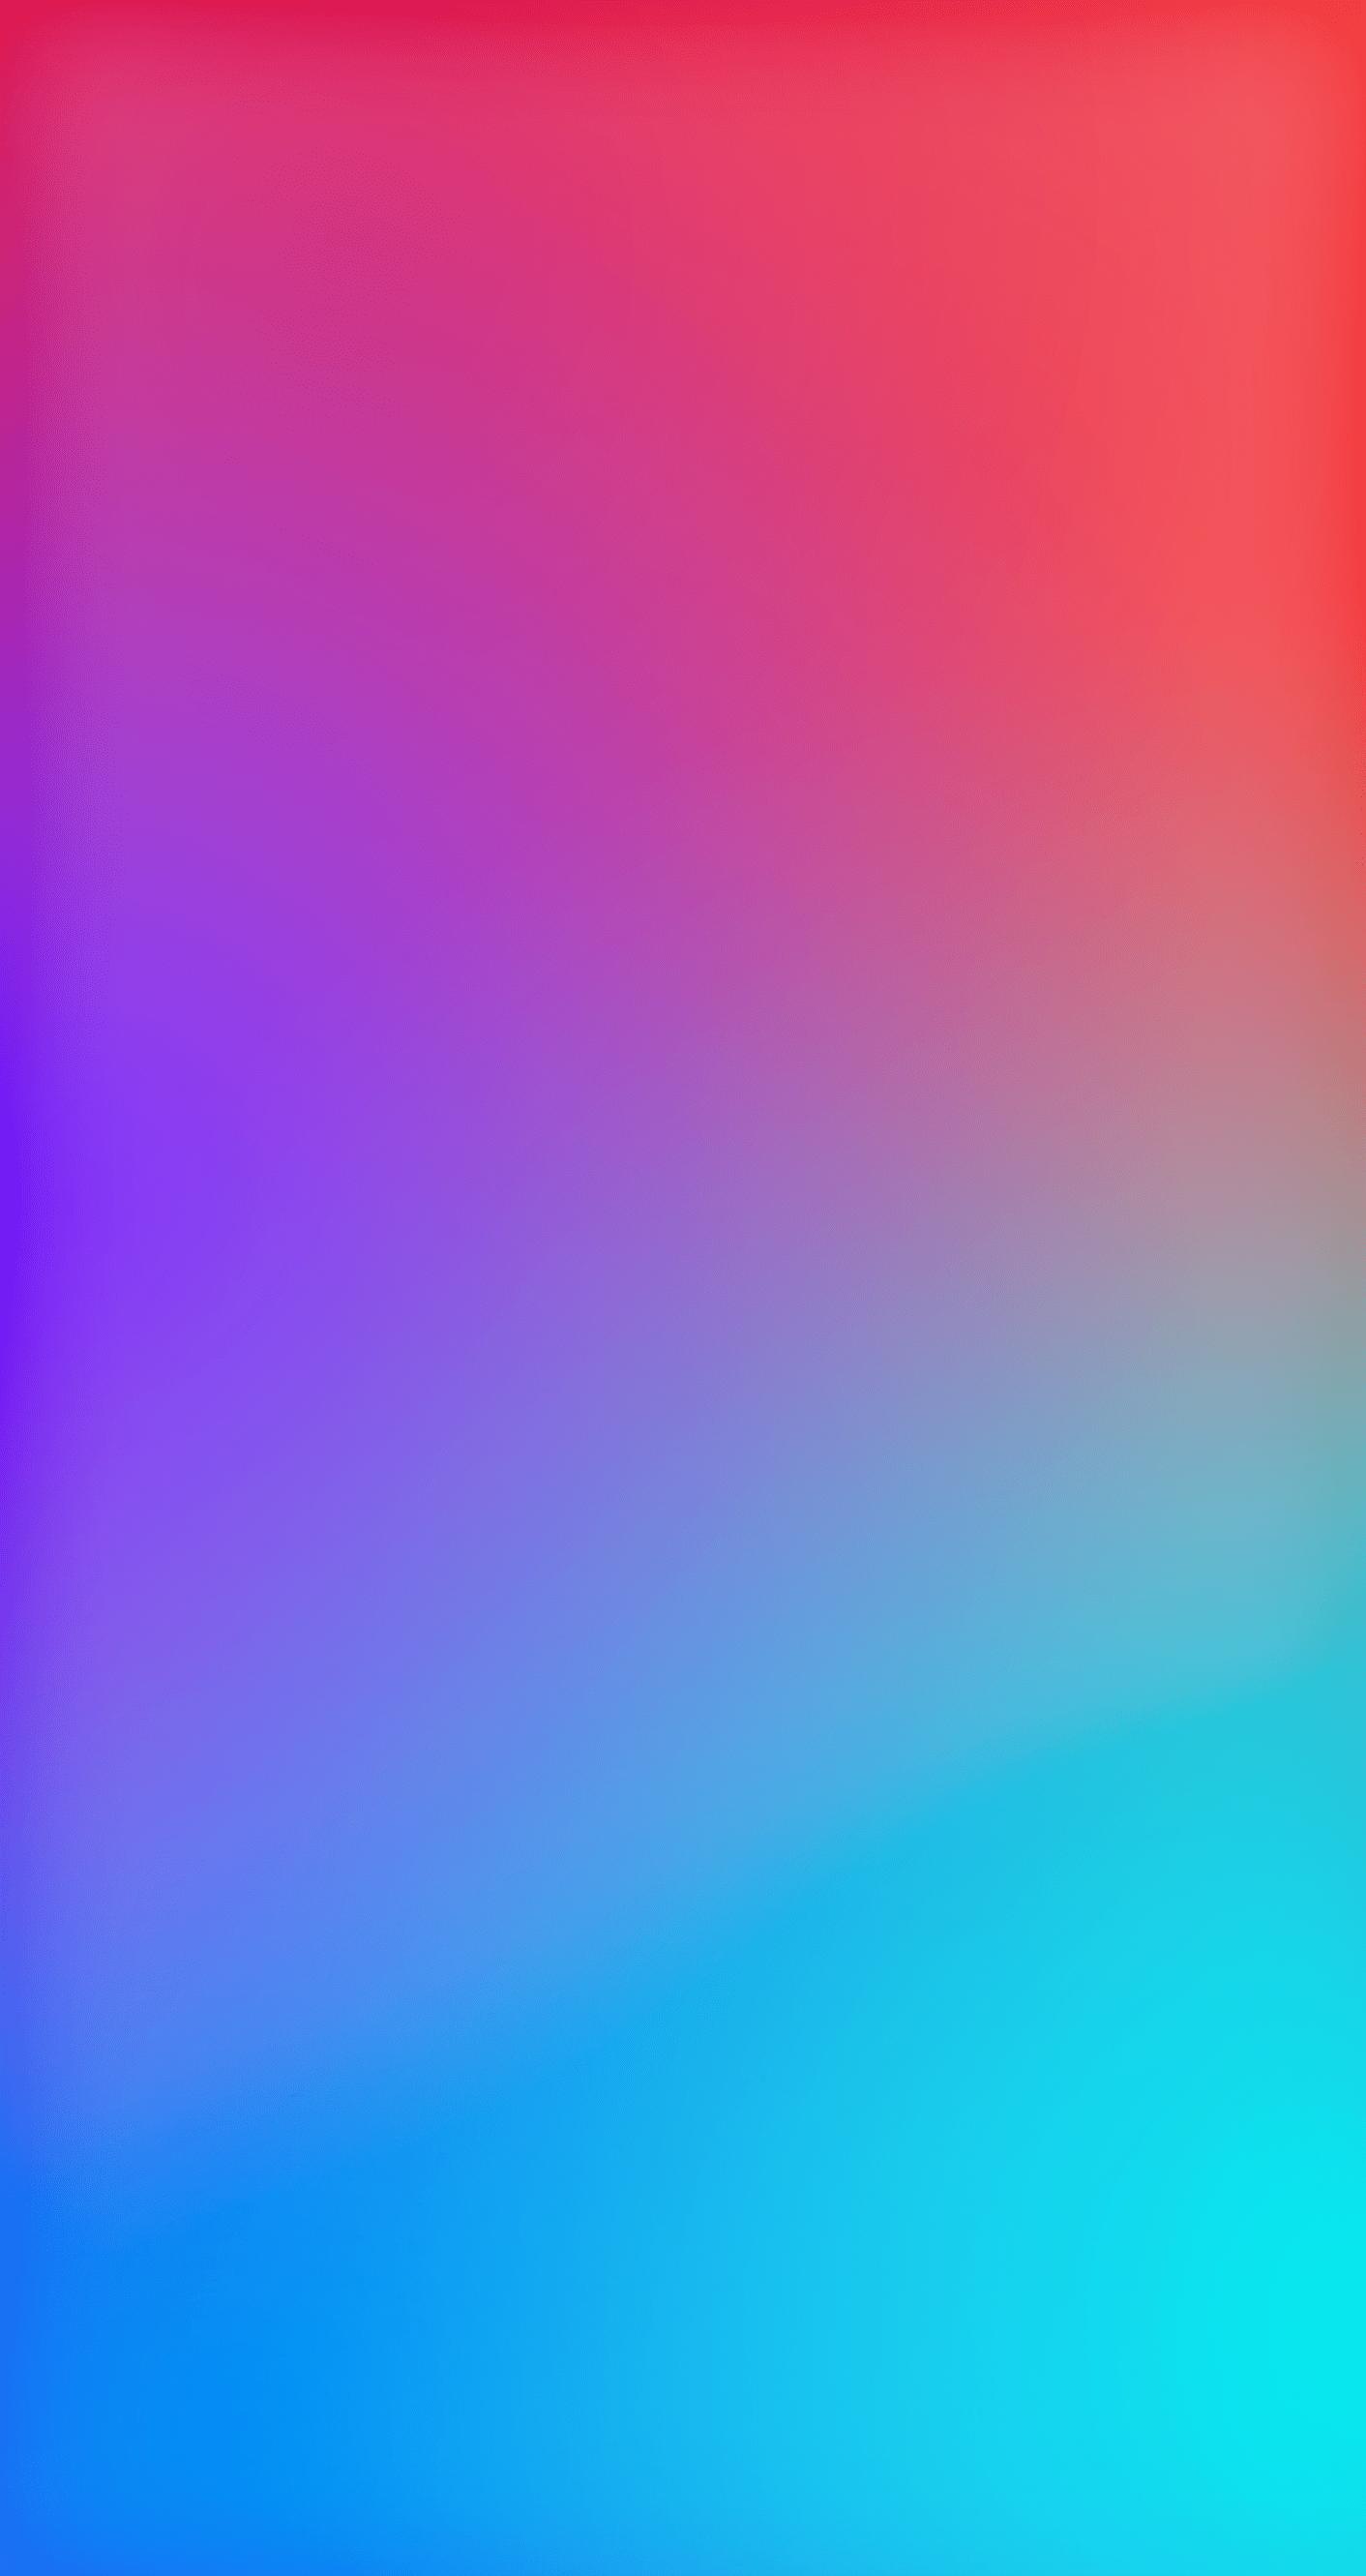 Apple Music Wallpaper Iphone Apple Music 158245 Hd